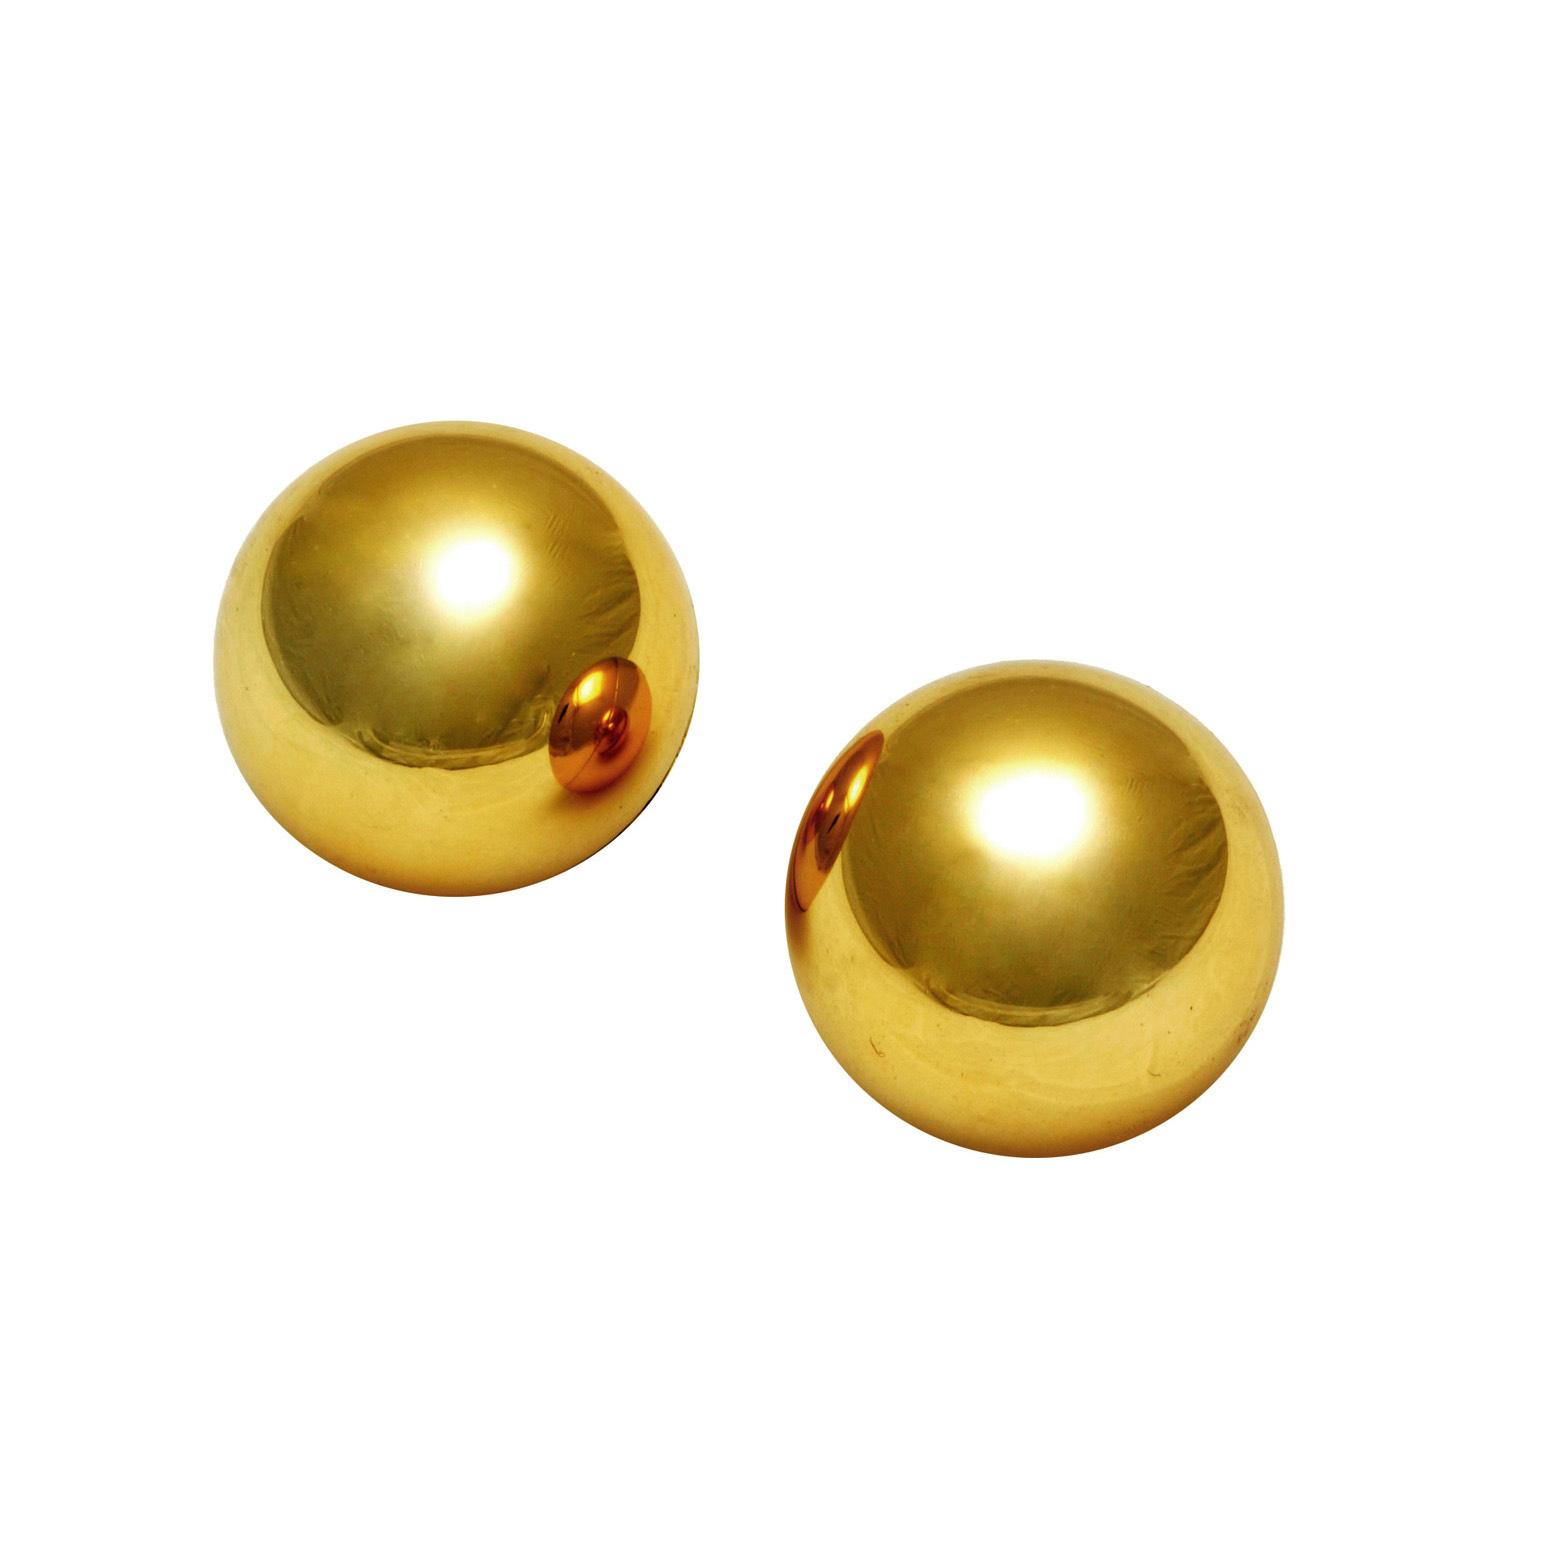 Sirs 1 Inch Golden Benwa Balls